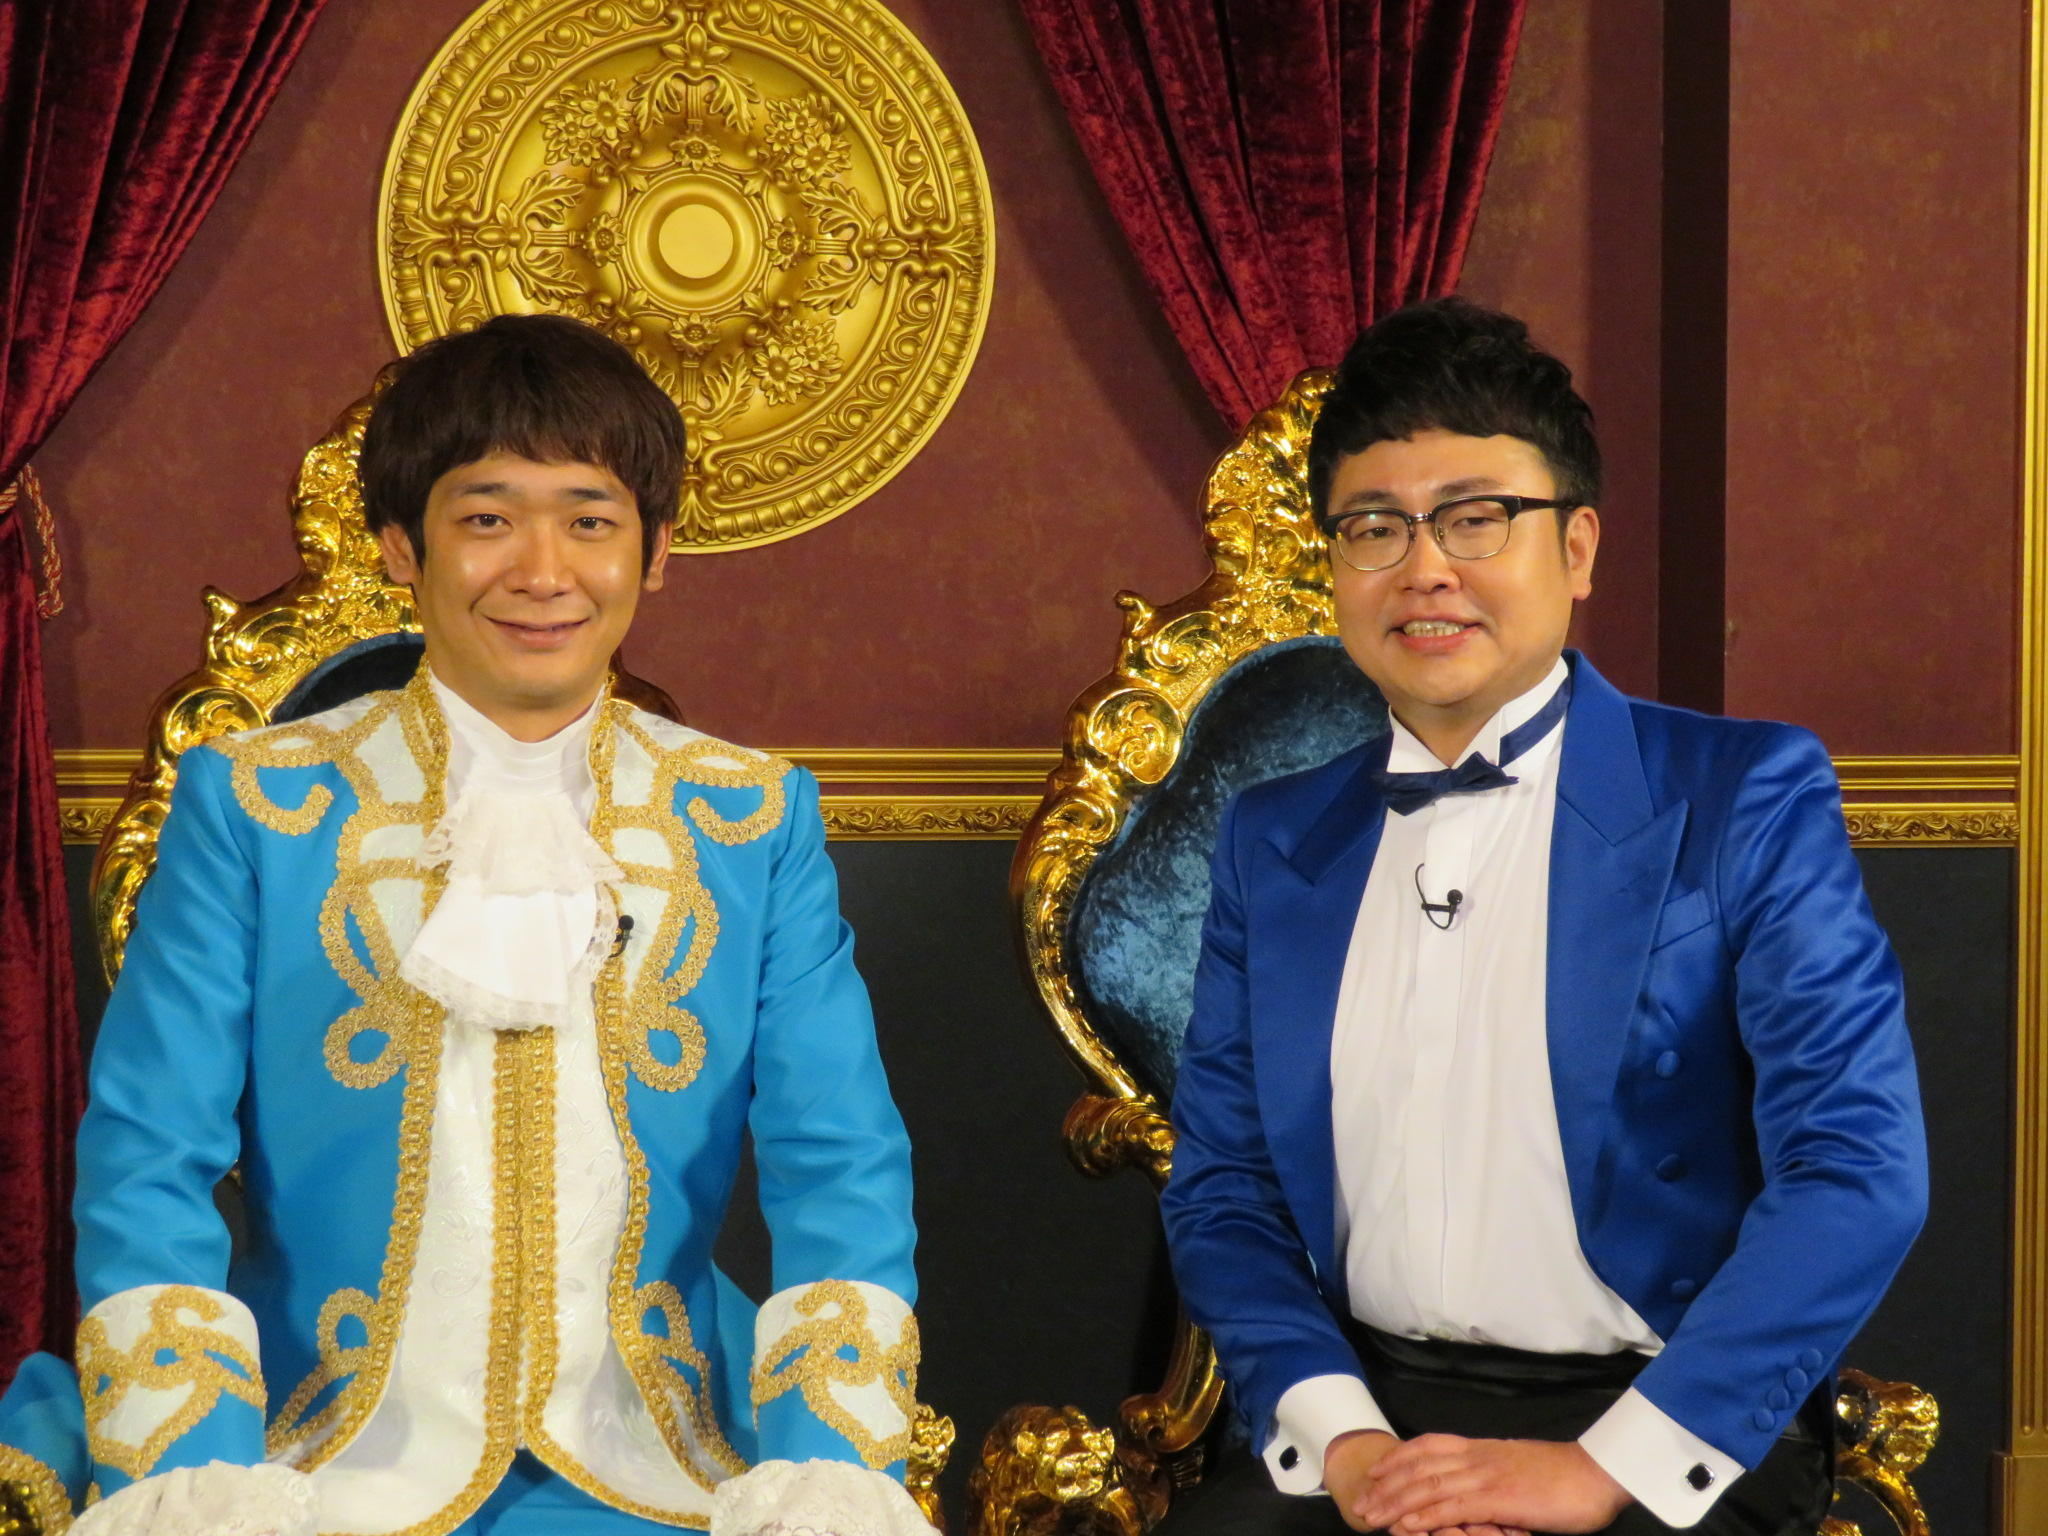 http://news.yoshimoto.co.jp/20180307201544-92853482b65f593962a9f7dd3cd57fce2f8f871e.jpg